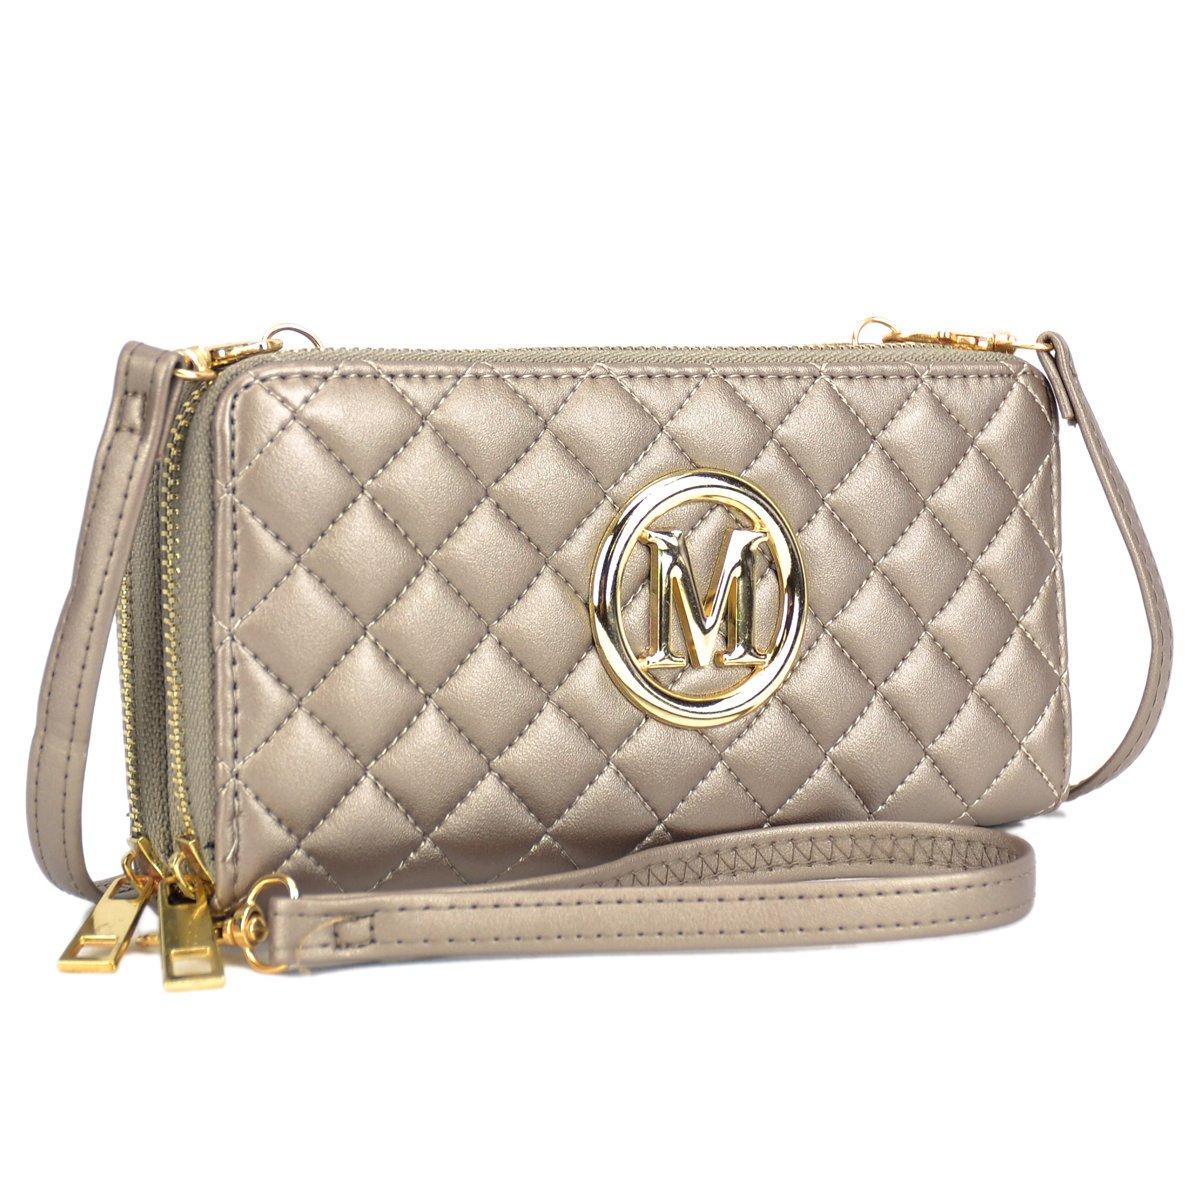 Women Quilted Leather Wallet Clutch Large Travel Corssbody Shoulder Purse Zip Around